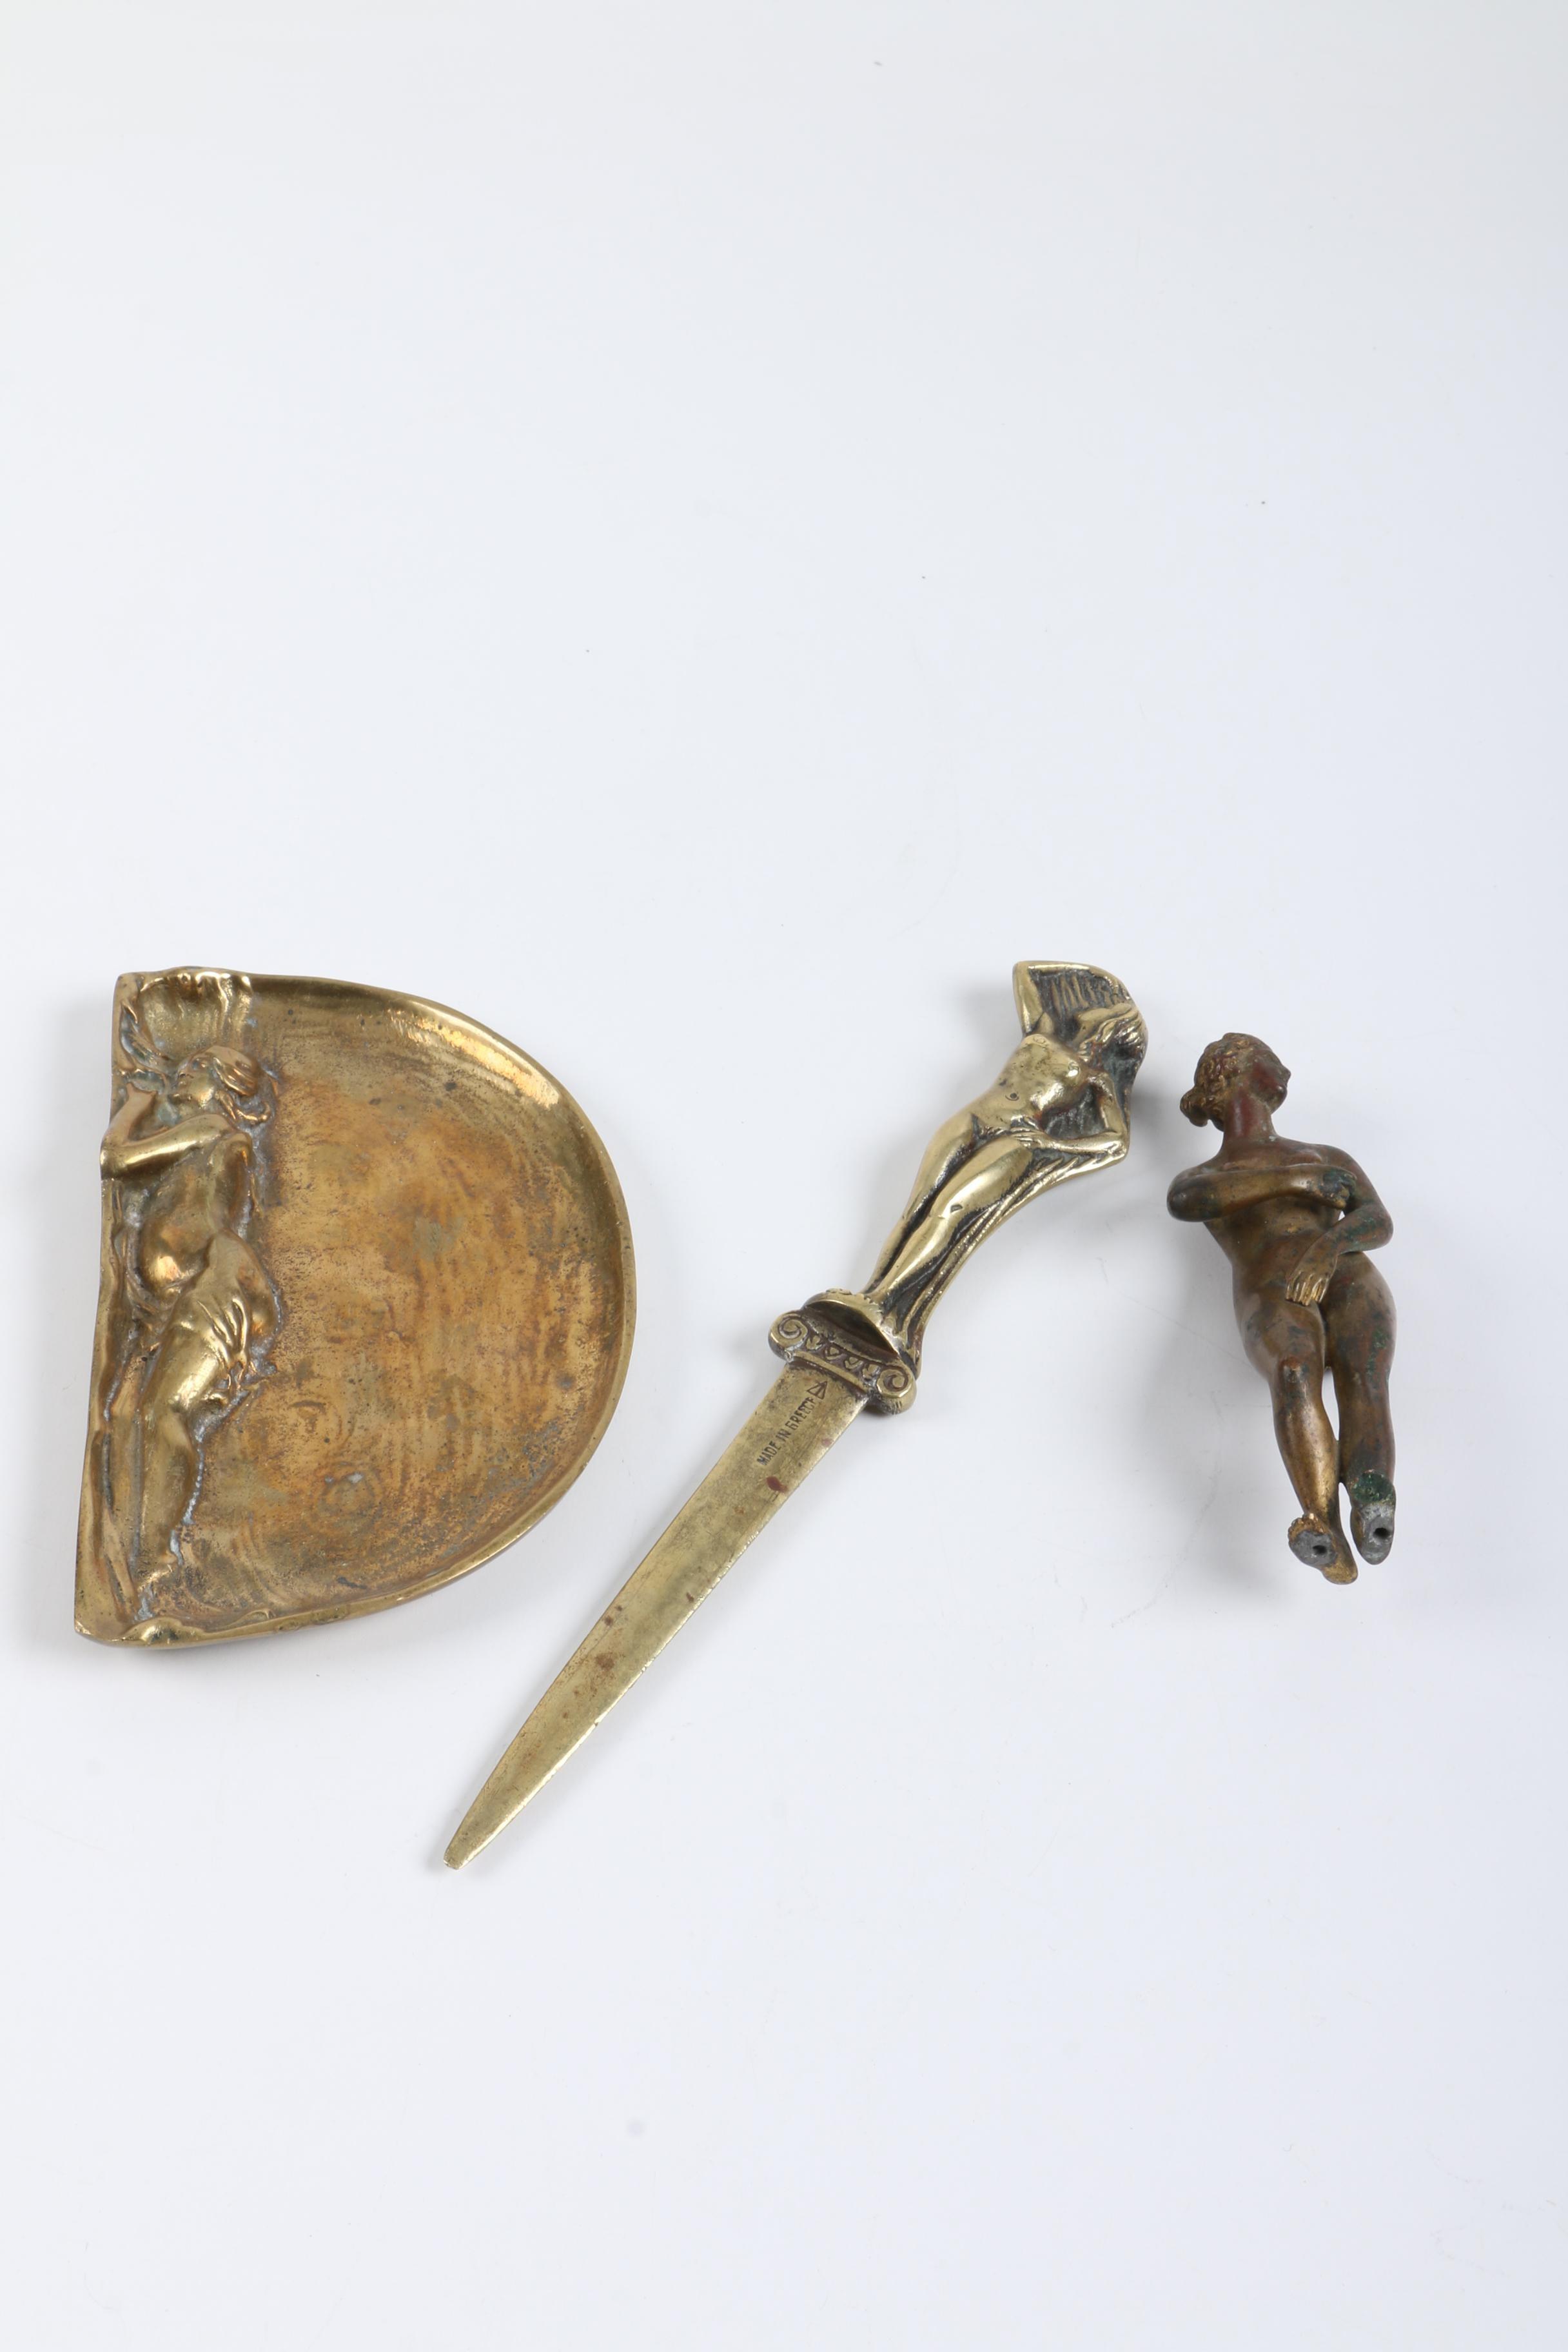 Brass Decor Including Greek Letter Opener